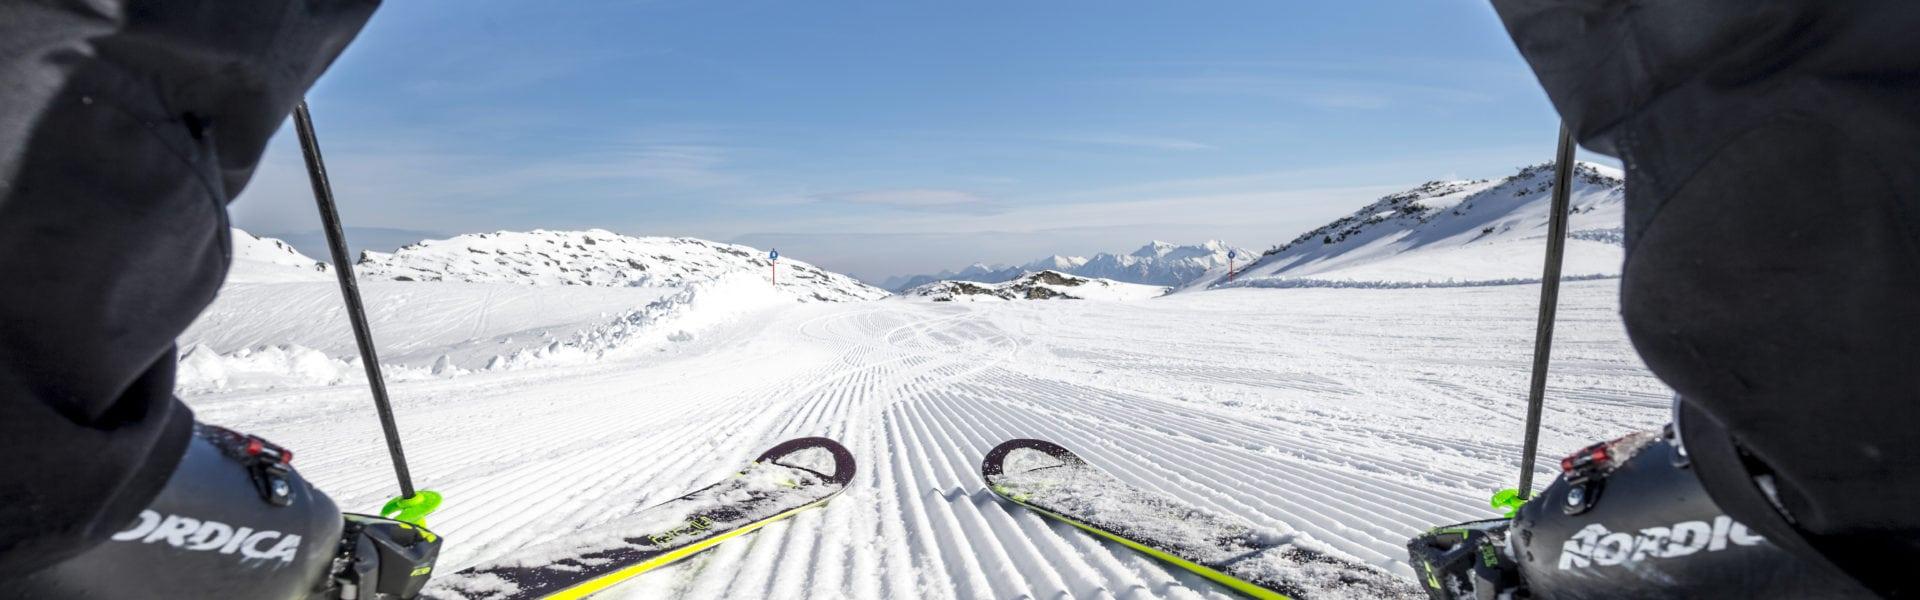 Skifahren am Ifen © Dominik Berchtold/Kleinwalsertal Tourismus eGen